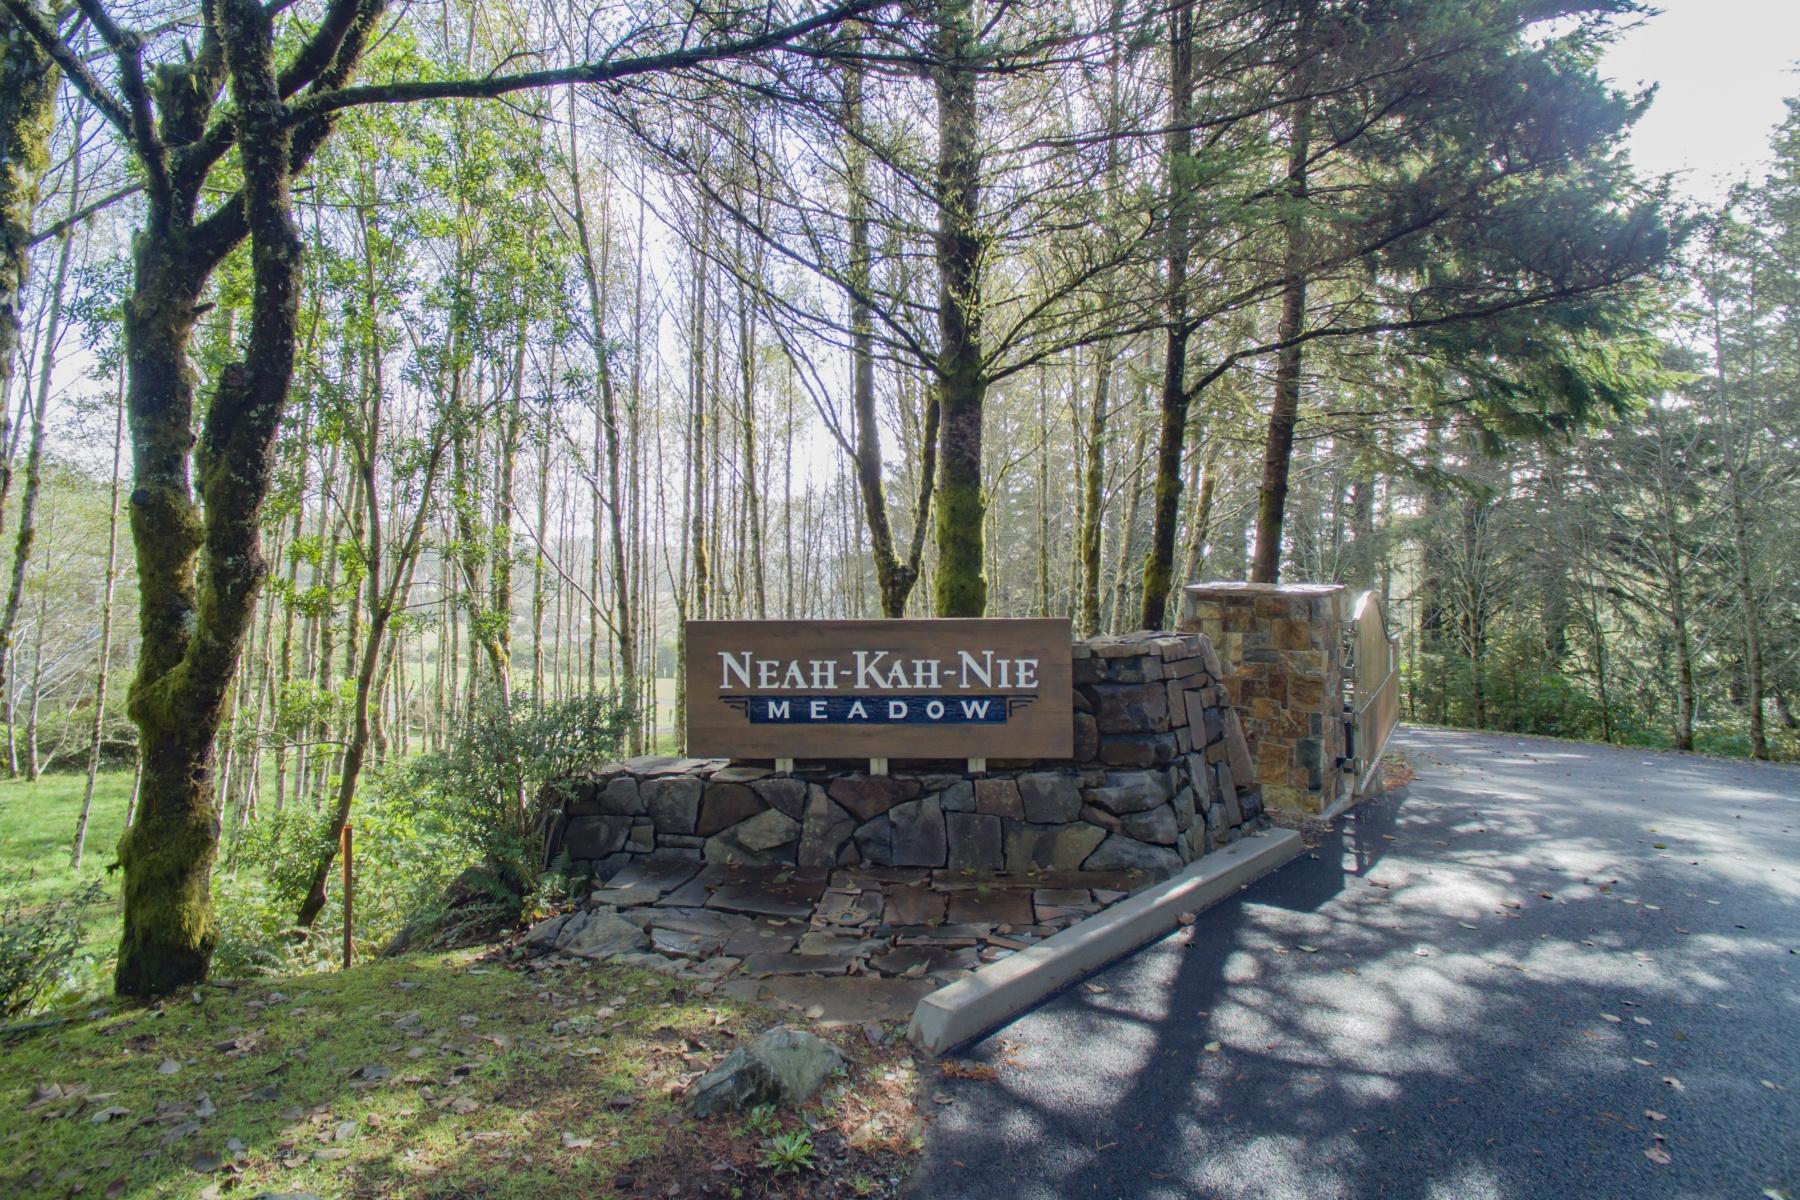 Đất đai vì Bán tại 3 Meadow LOOP, MANZANITA, OR Manzanita, Oregon 97130 Hoa Kỳ